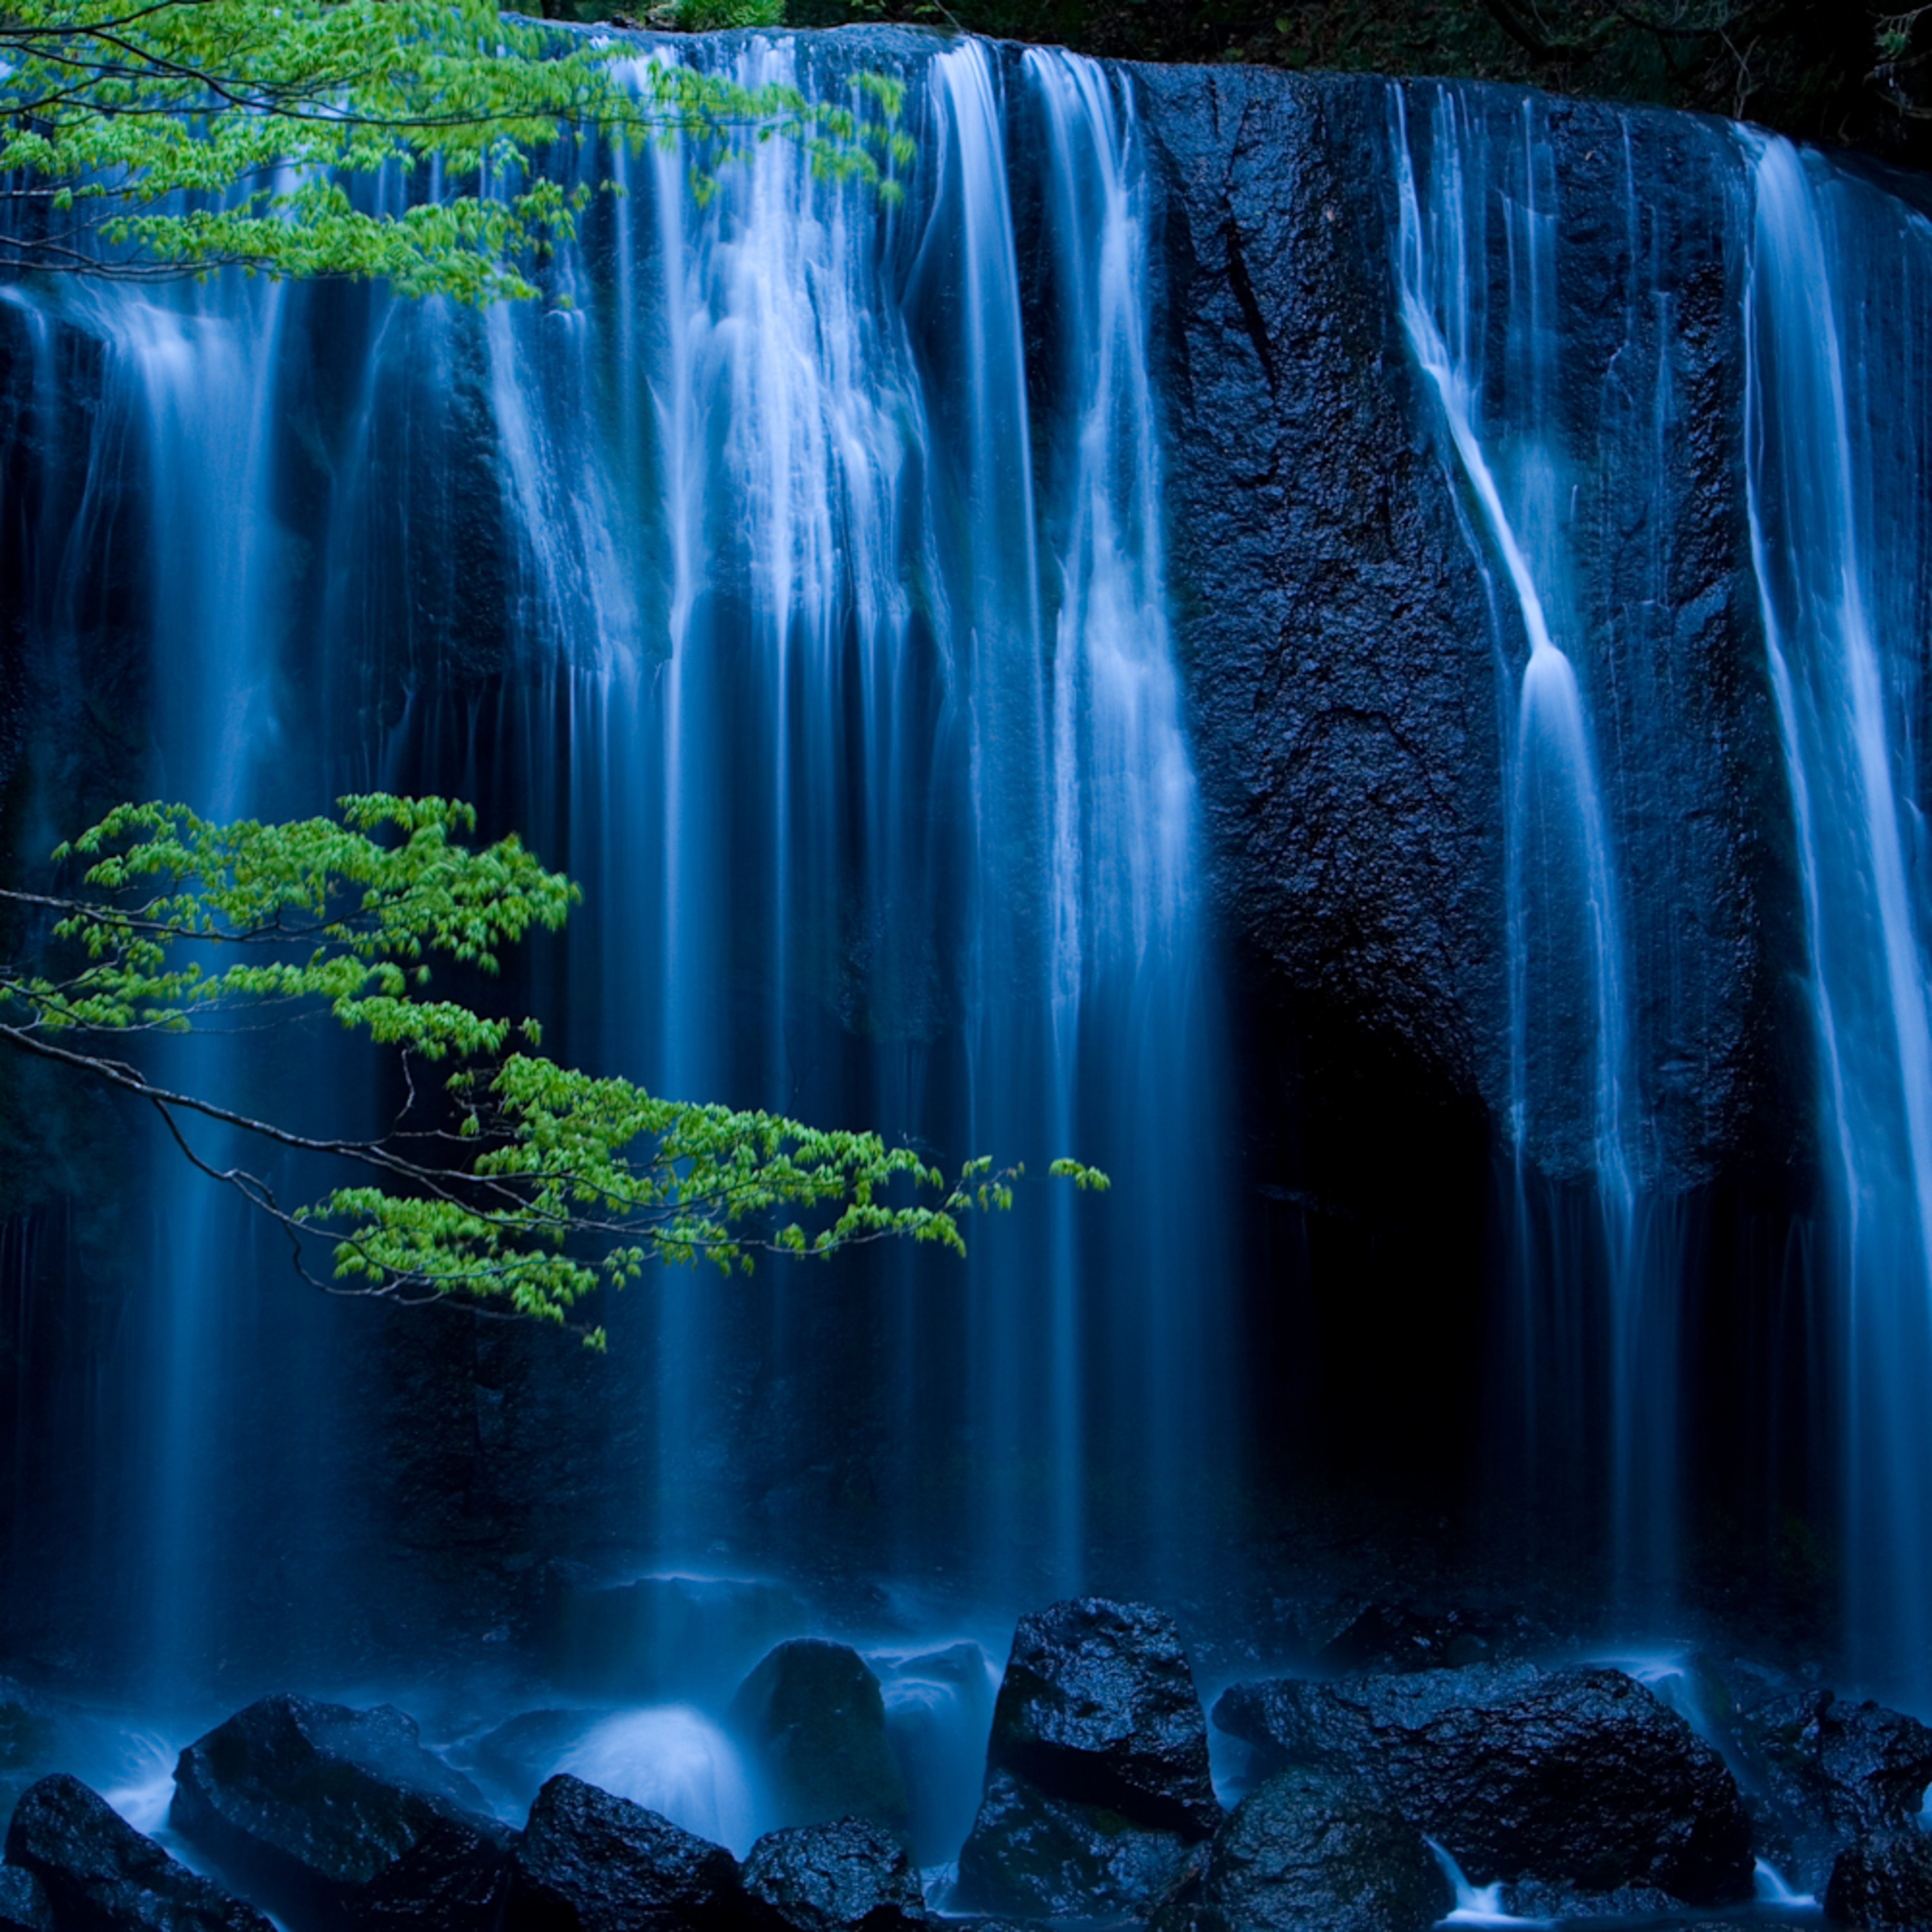 Mbp inawashiro tatsuzawa falls 20070519 0097 eemoek